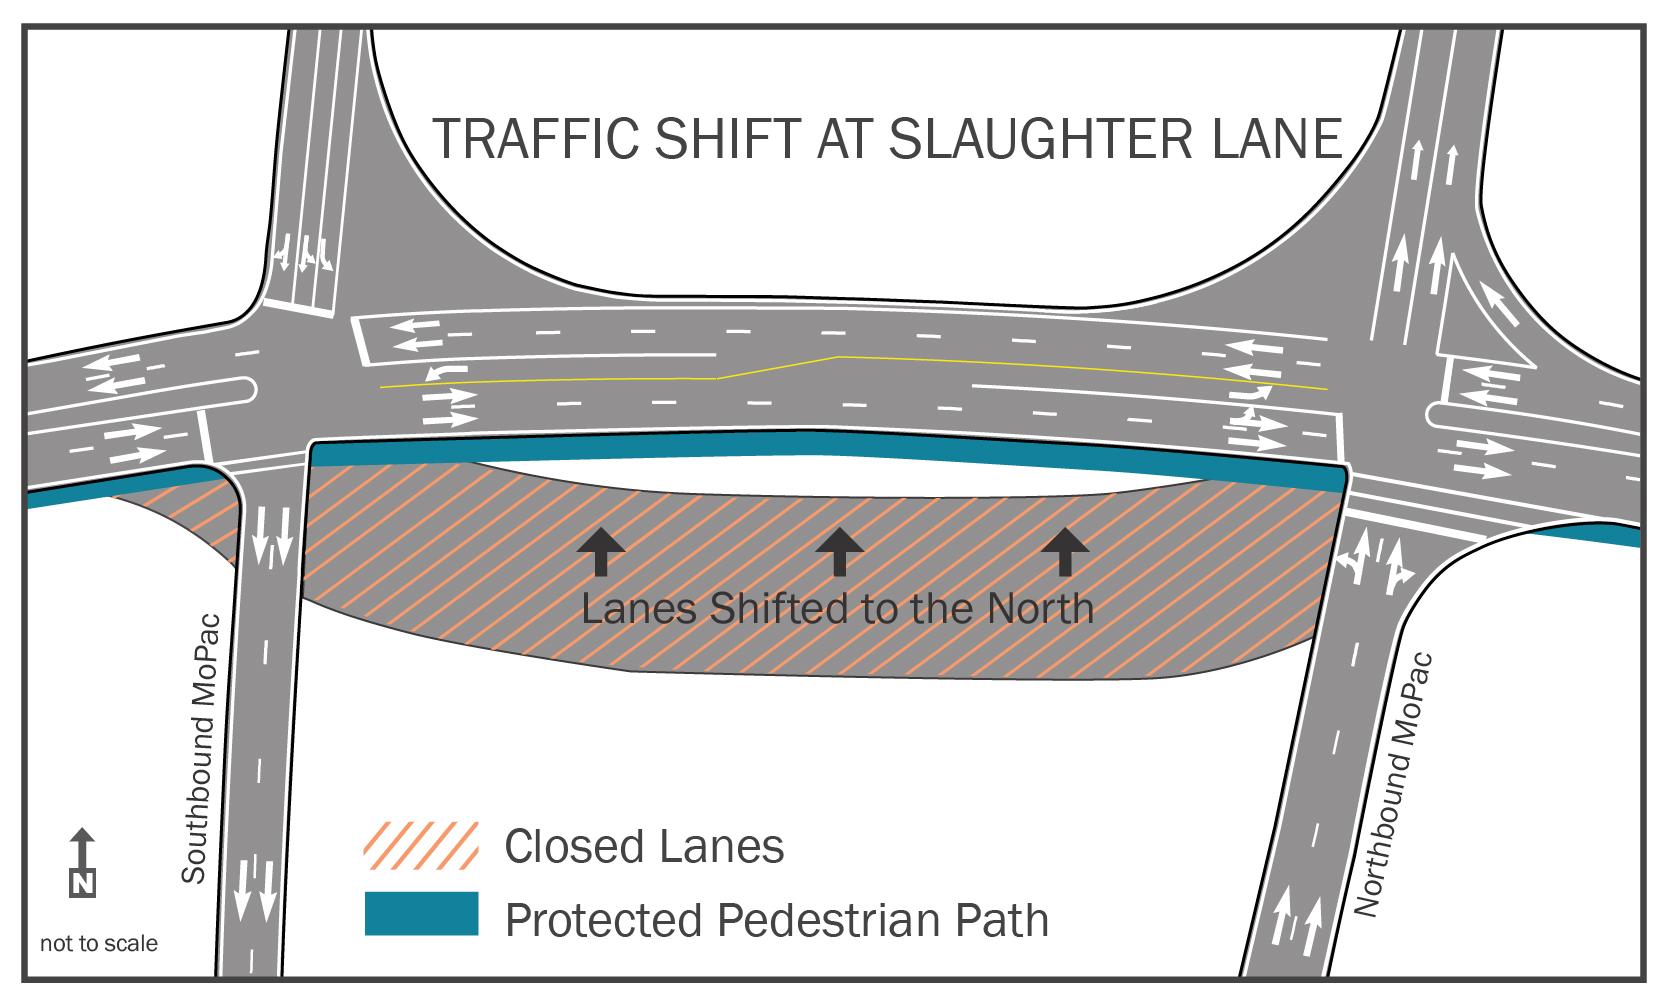 South Mopac traffic shift at Slaughter Lane